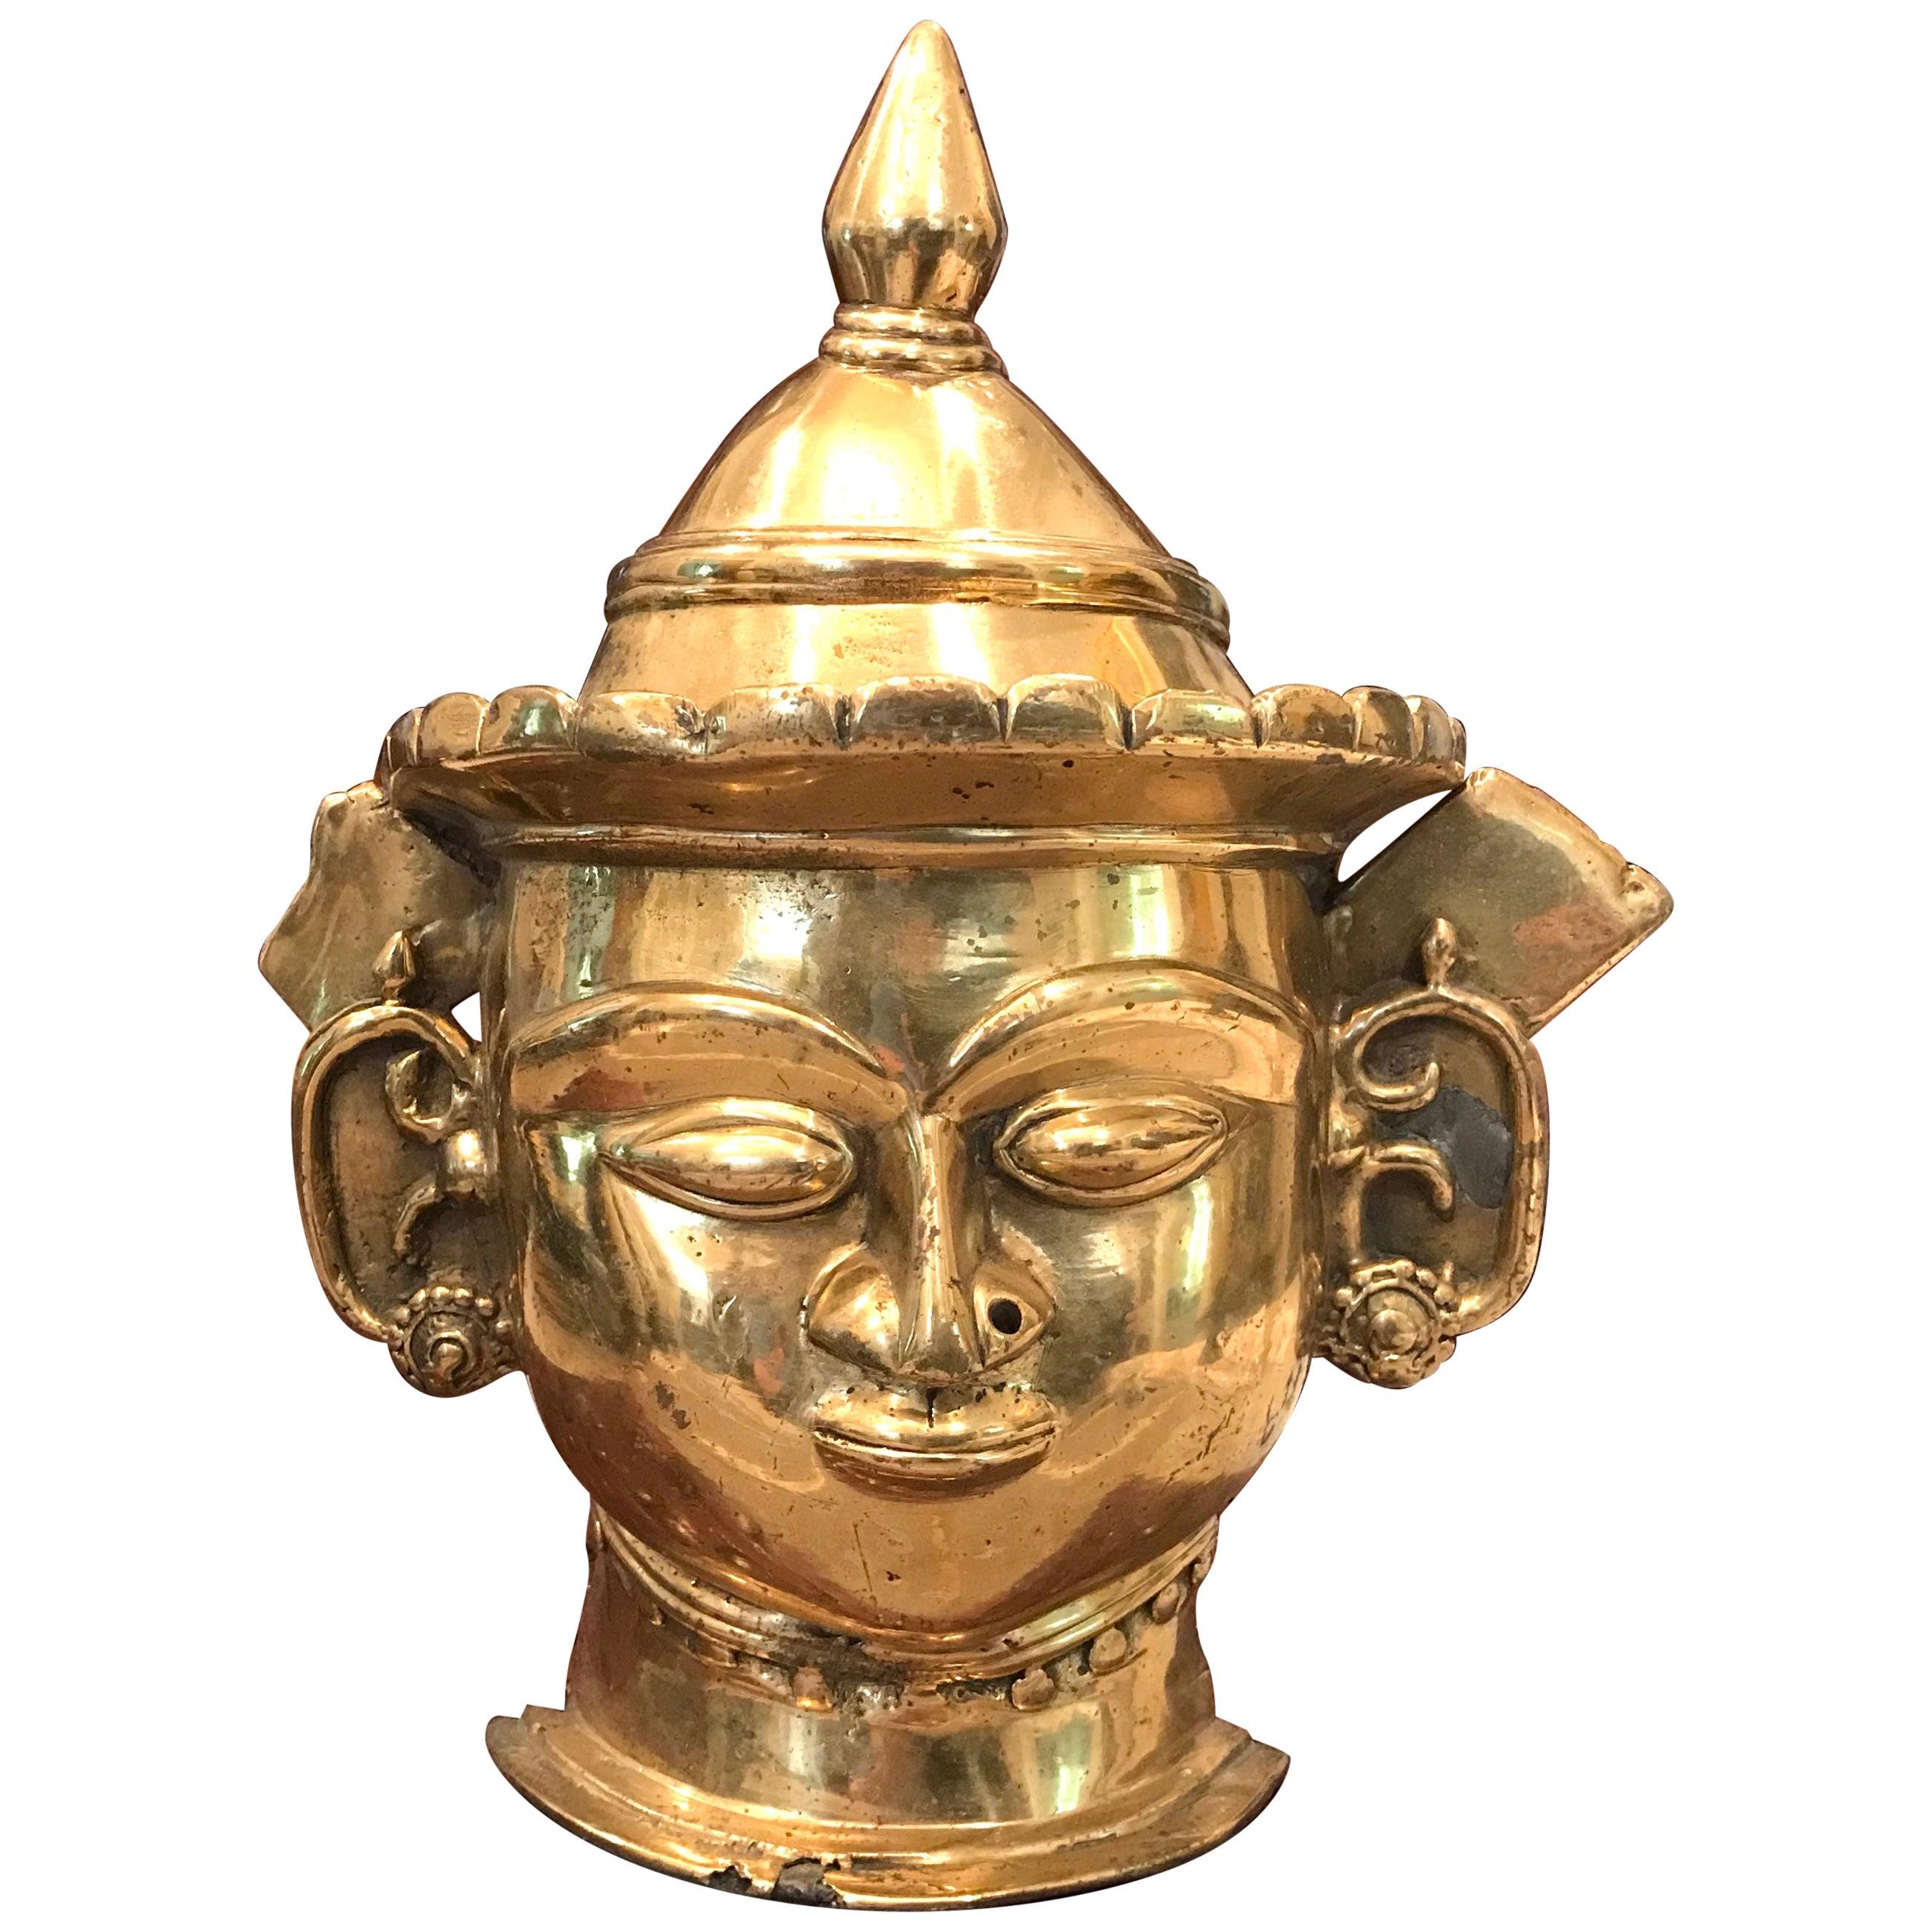 17th-18th Century Indian Mukhalingam Gilt Bronze Mask